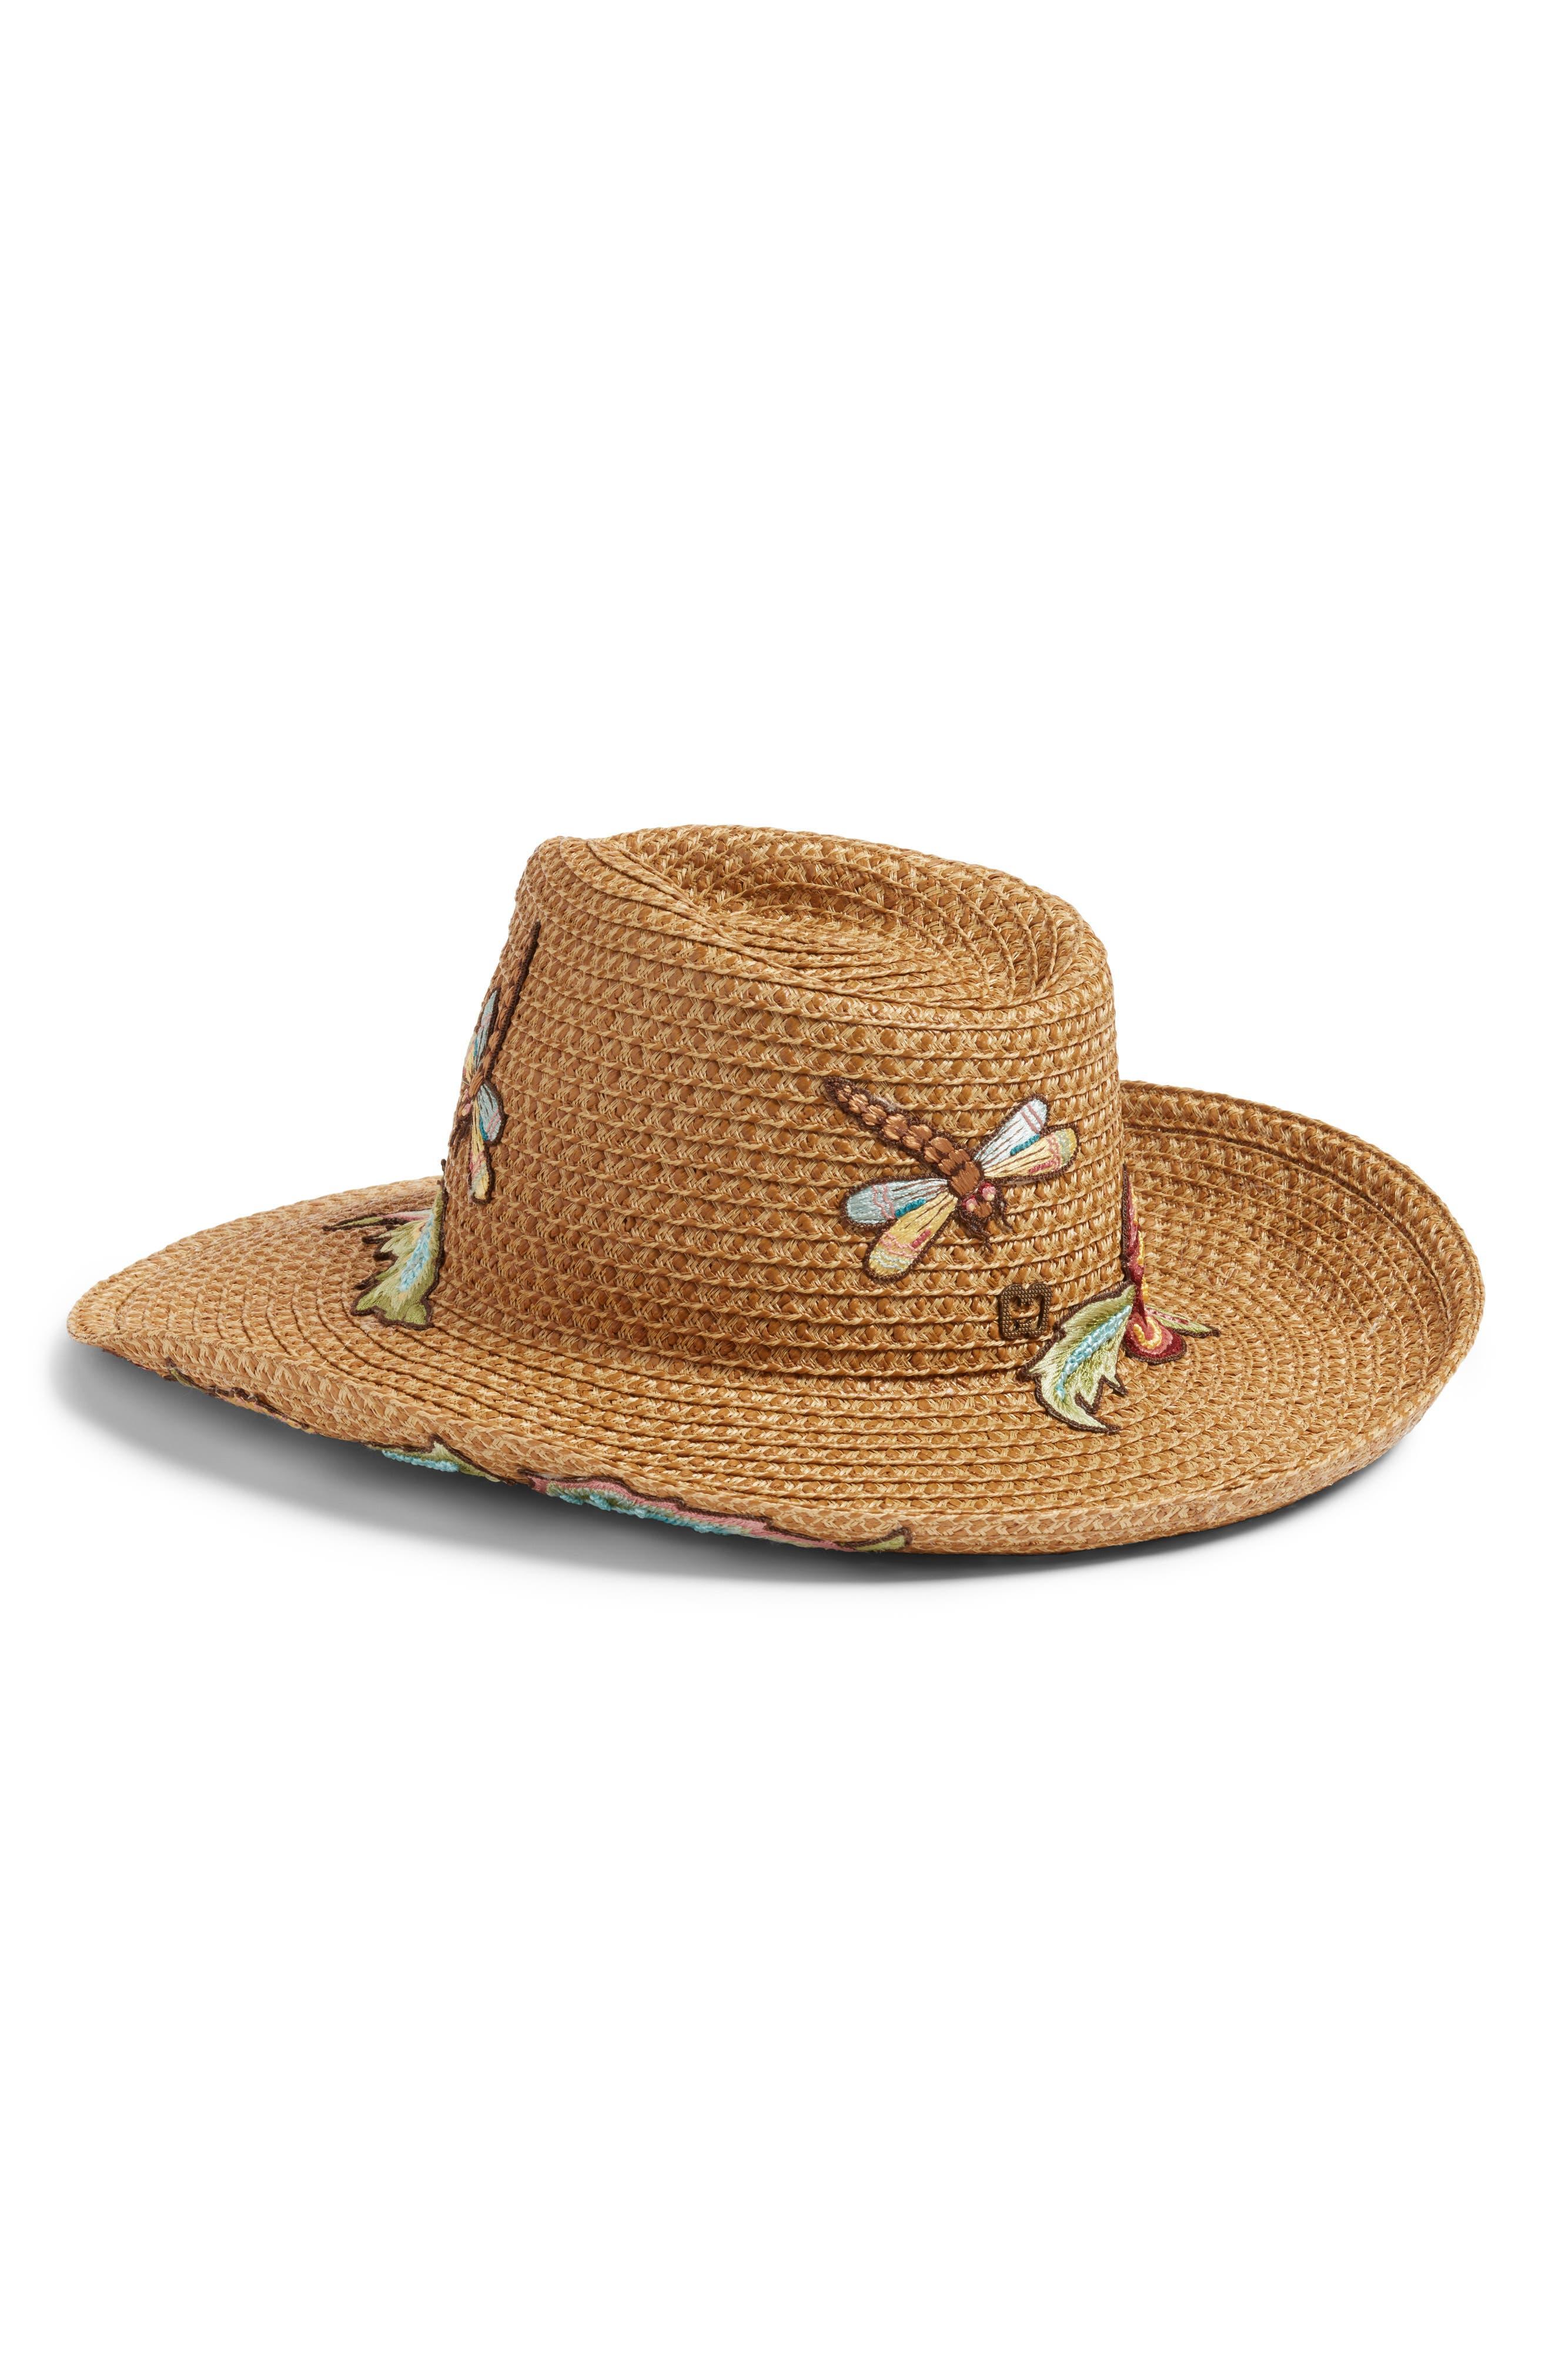 Eden Squishee® Western Hat by Eric Javits